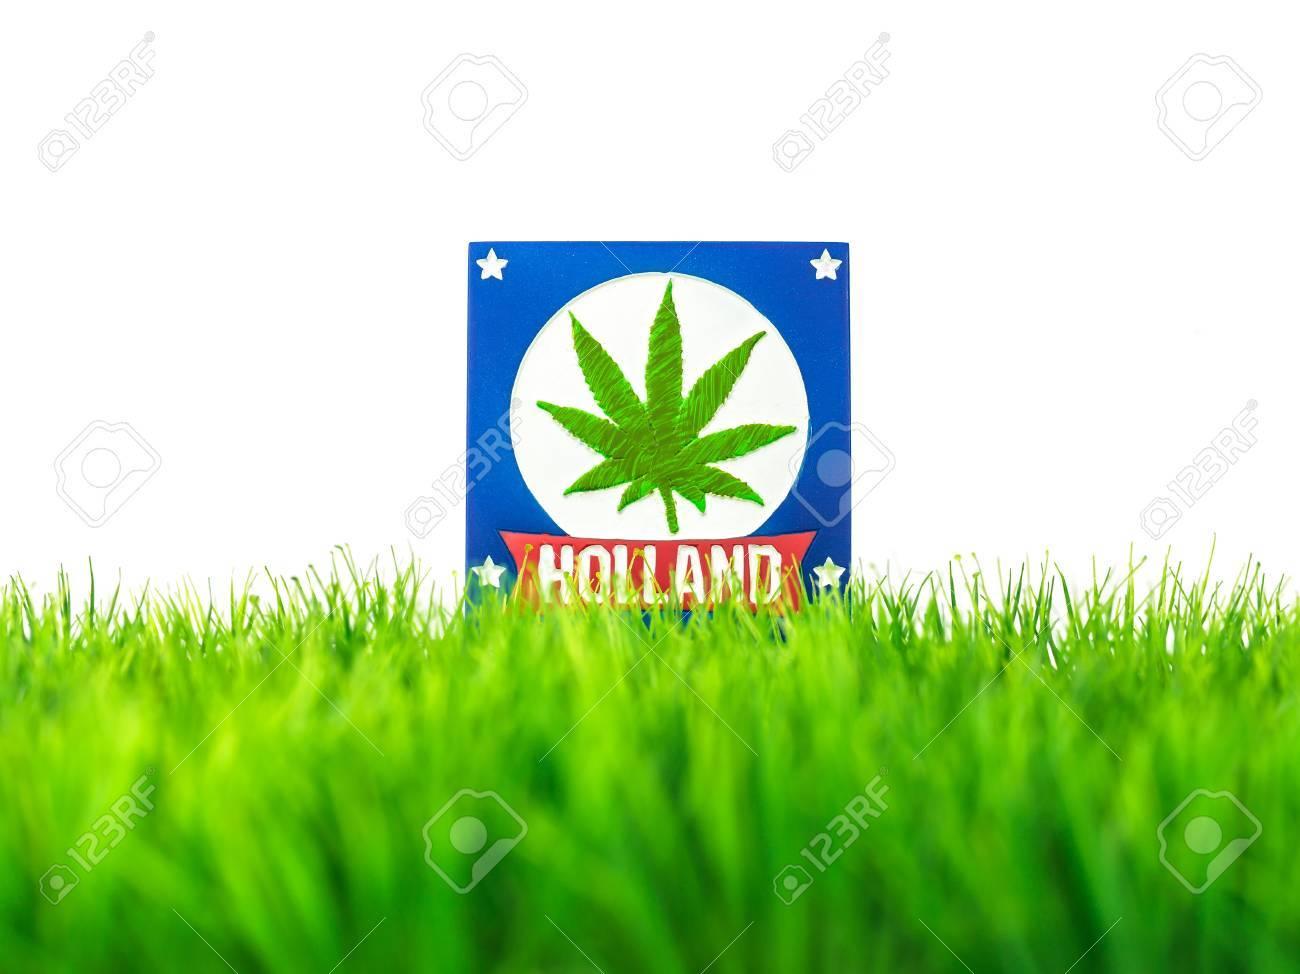 Dutch souvenir tile on grass with marijuana symbol isolated on white Stock Photo - 15612416